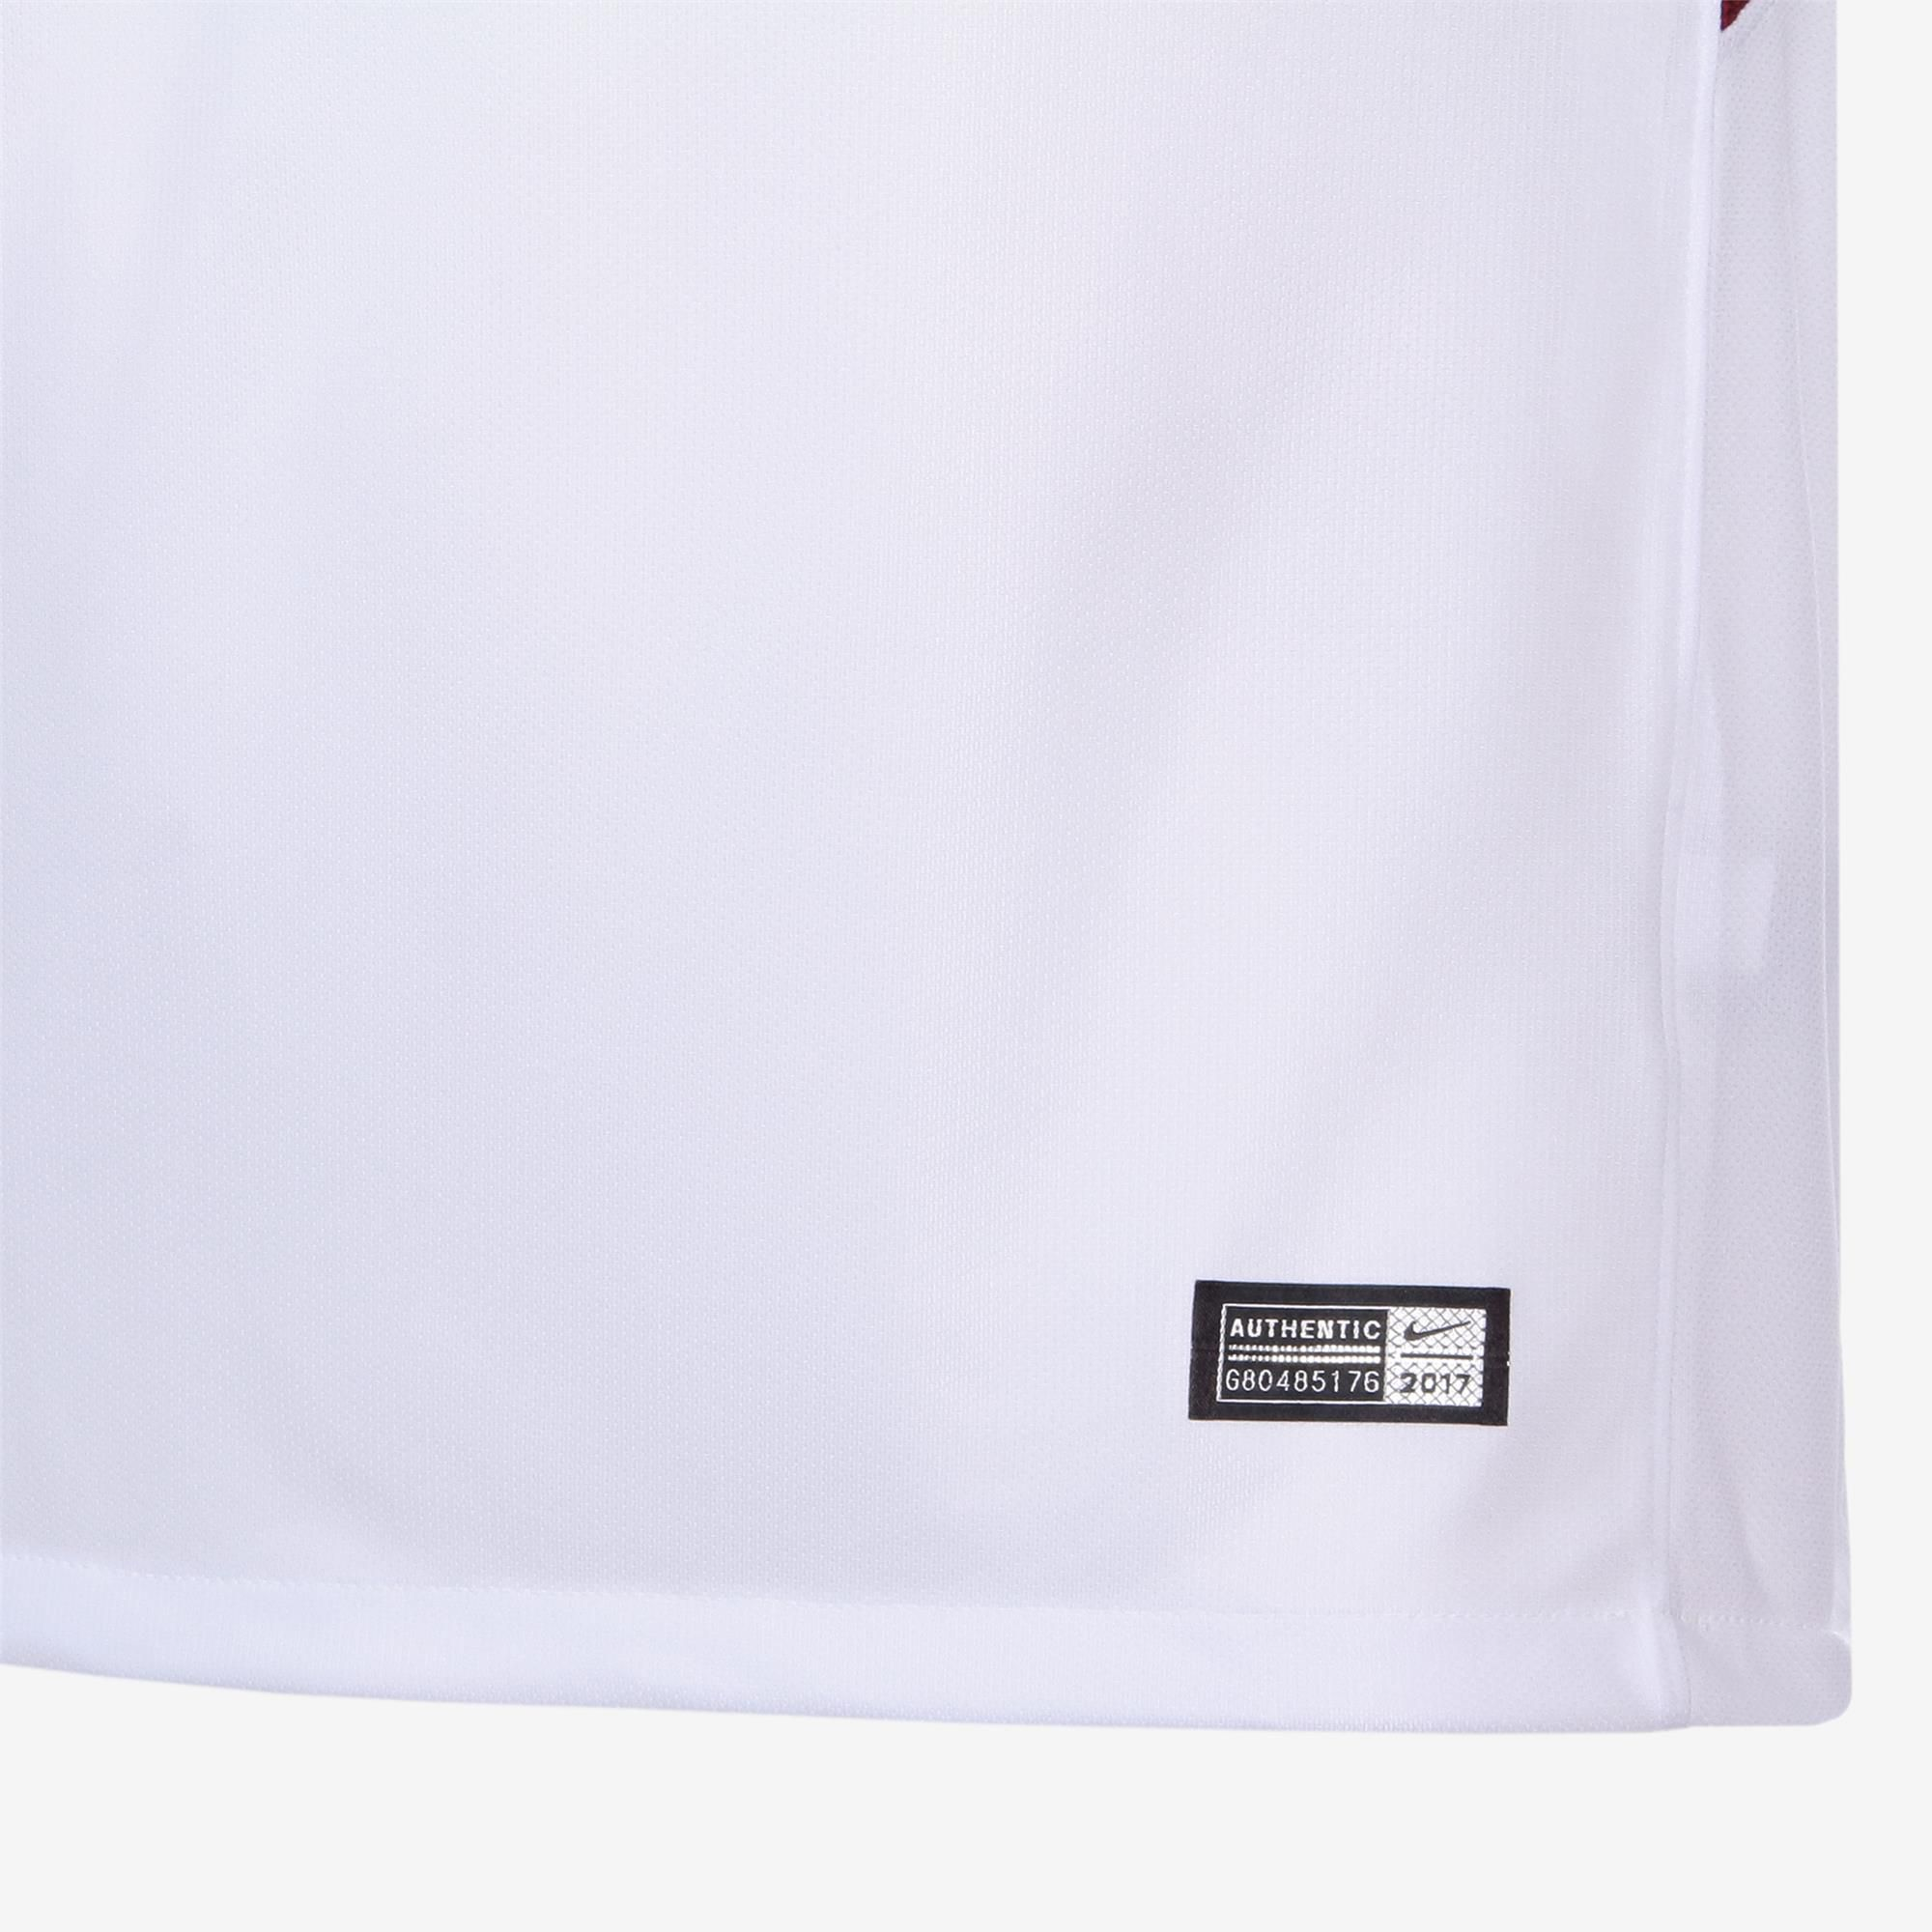 0eea7936b9 Camisa Nike Internacional Ii 17 18 S n° Torcedor - BRACIA SHOP  Loja ...